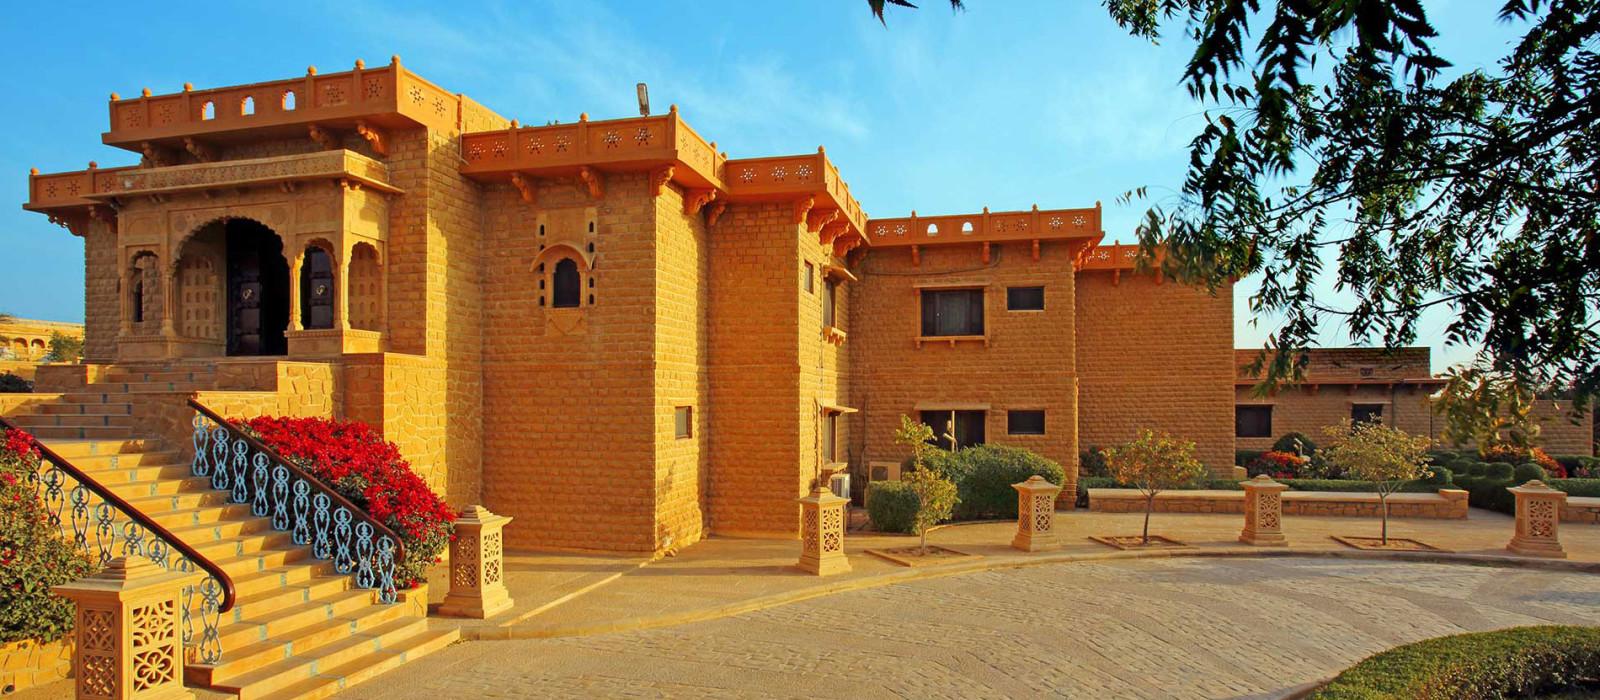 Hotel The Rawalkot, Jaisalmer Nordindien